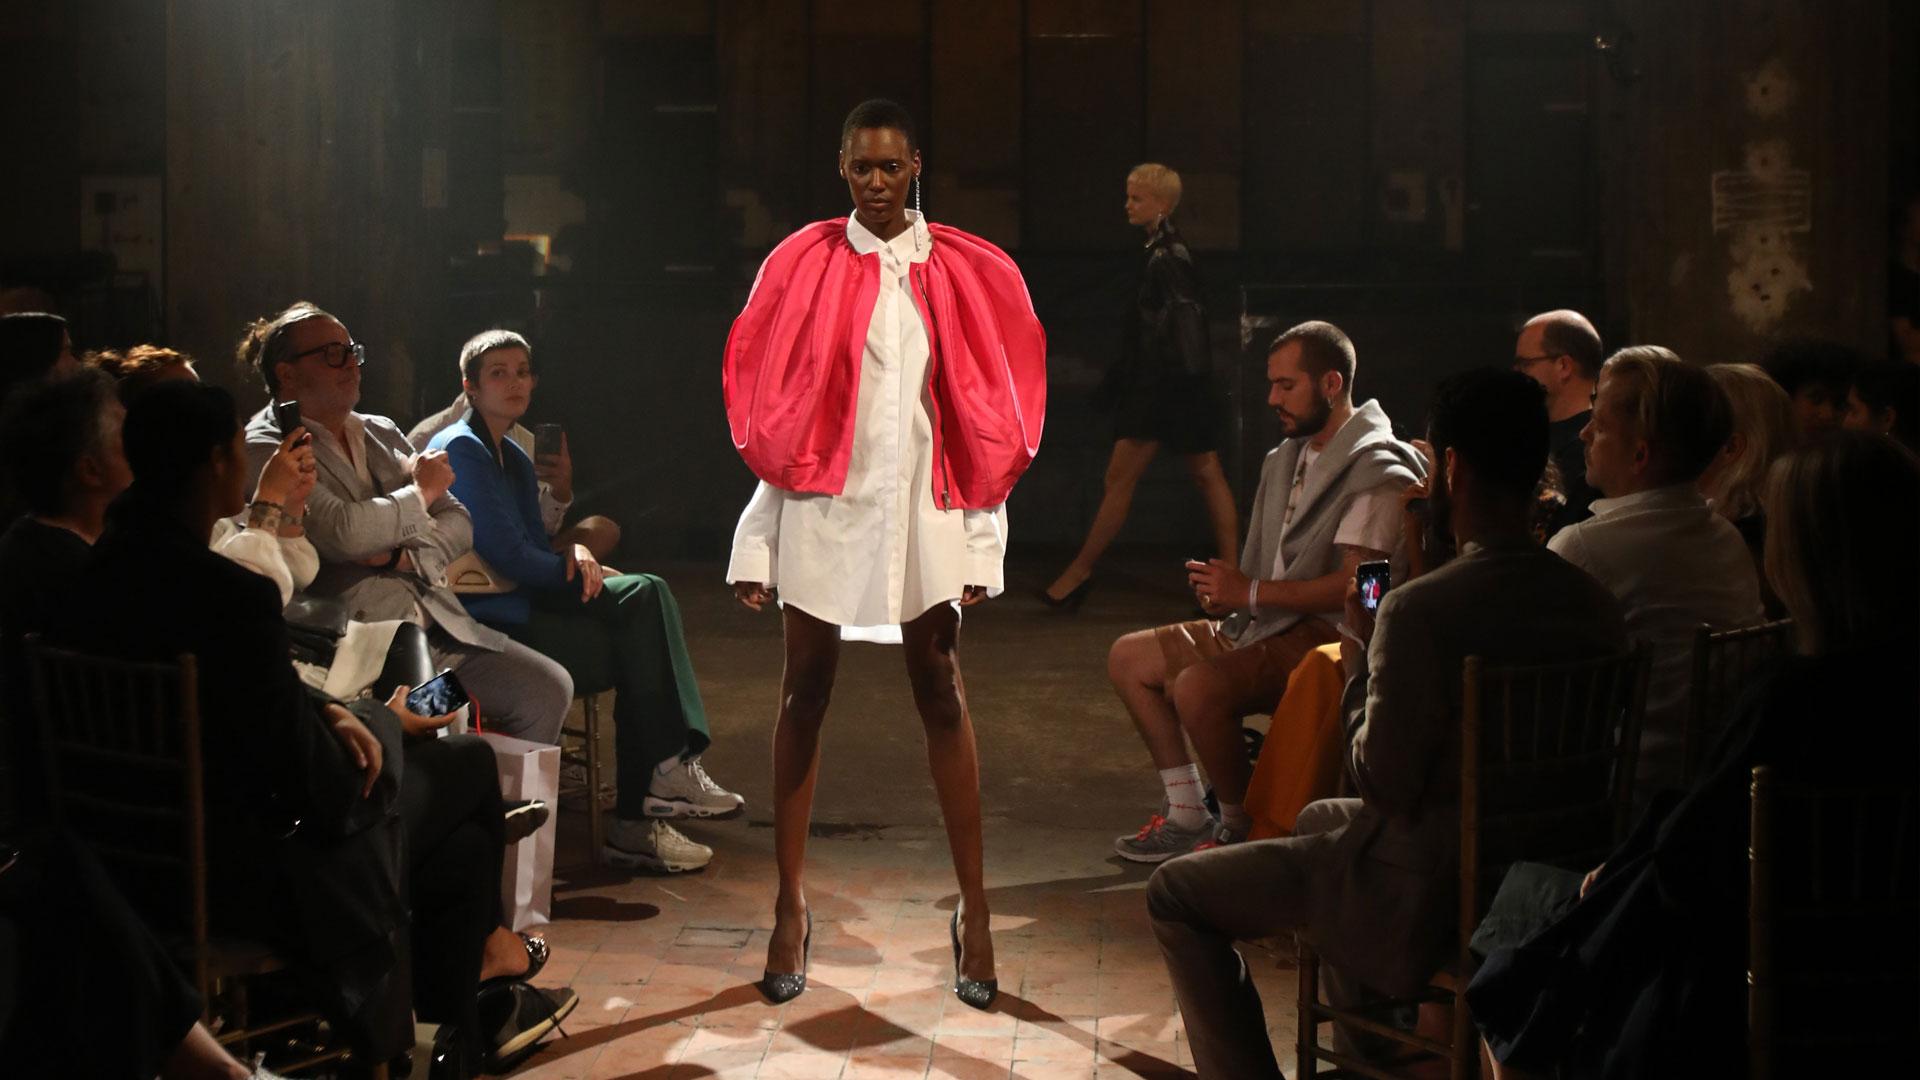 Fashion, Film, and Sustainability: Berlin Fashion Week 2021